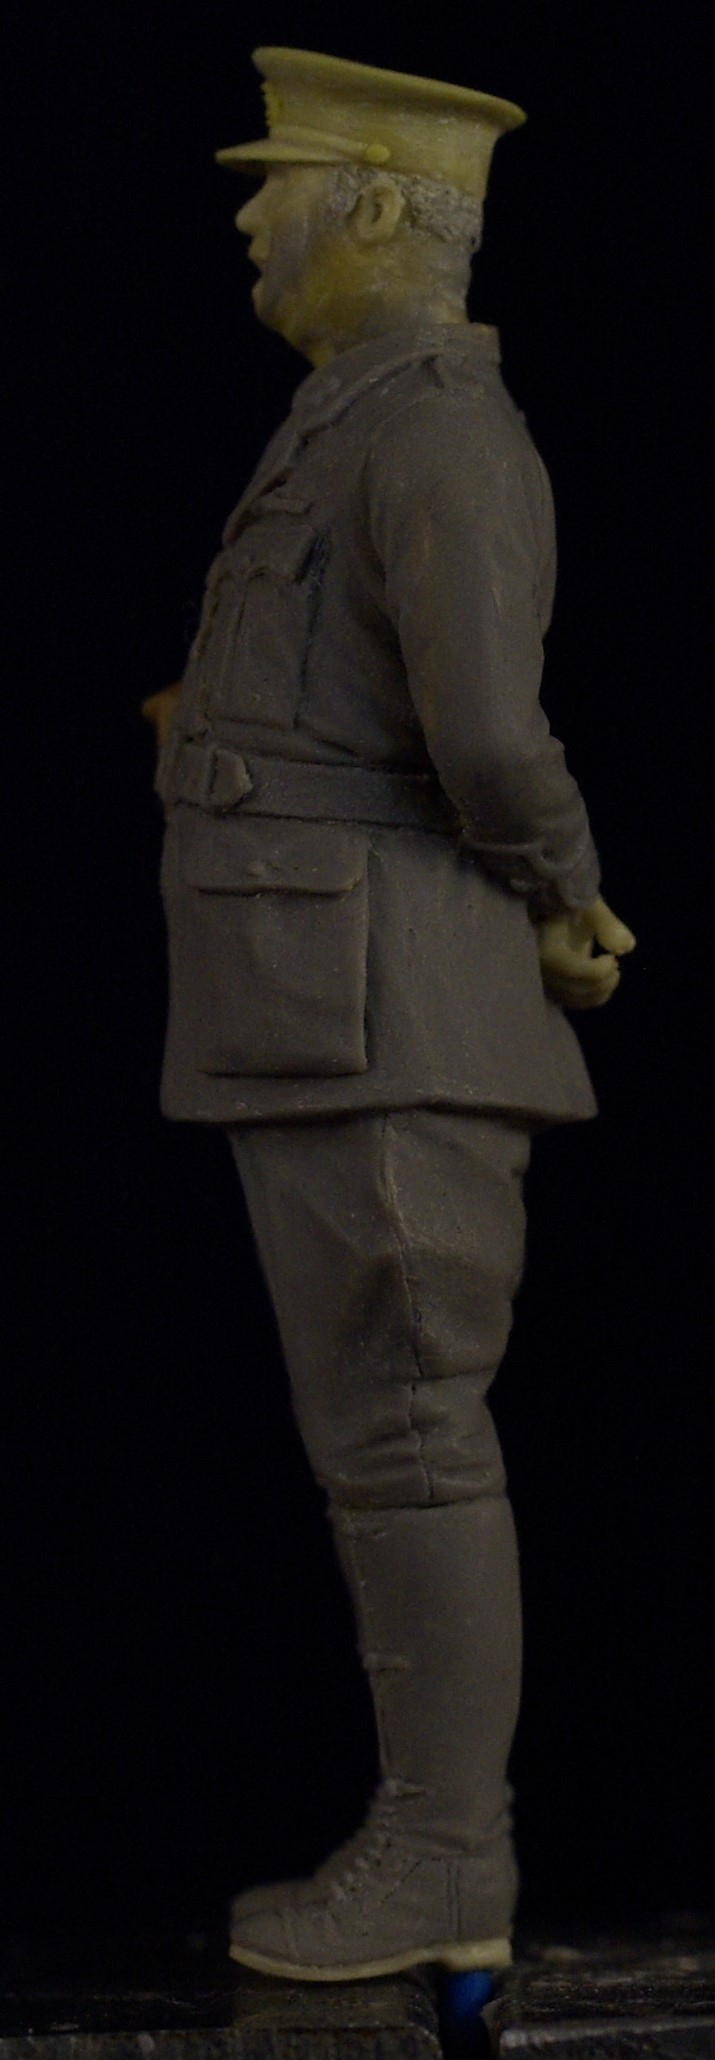 Le râleur, british officer WW1 - Page 2 _igp9111